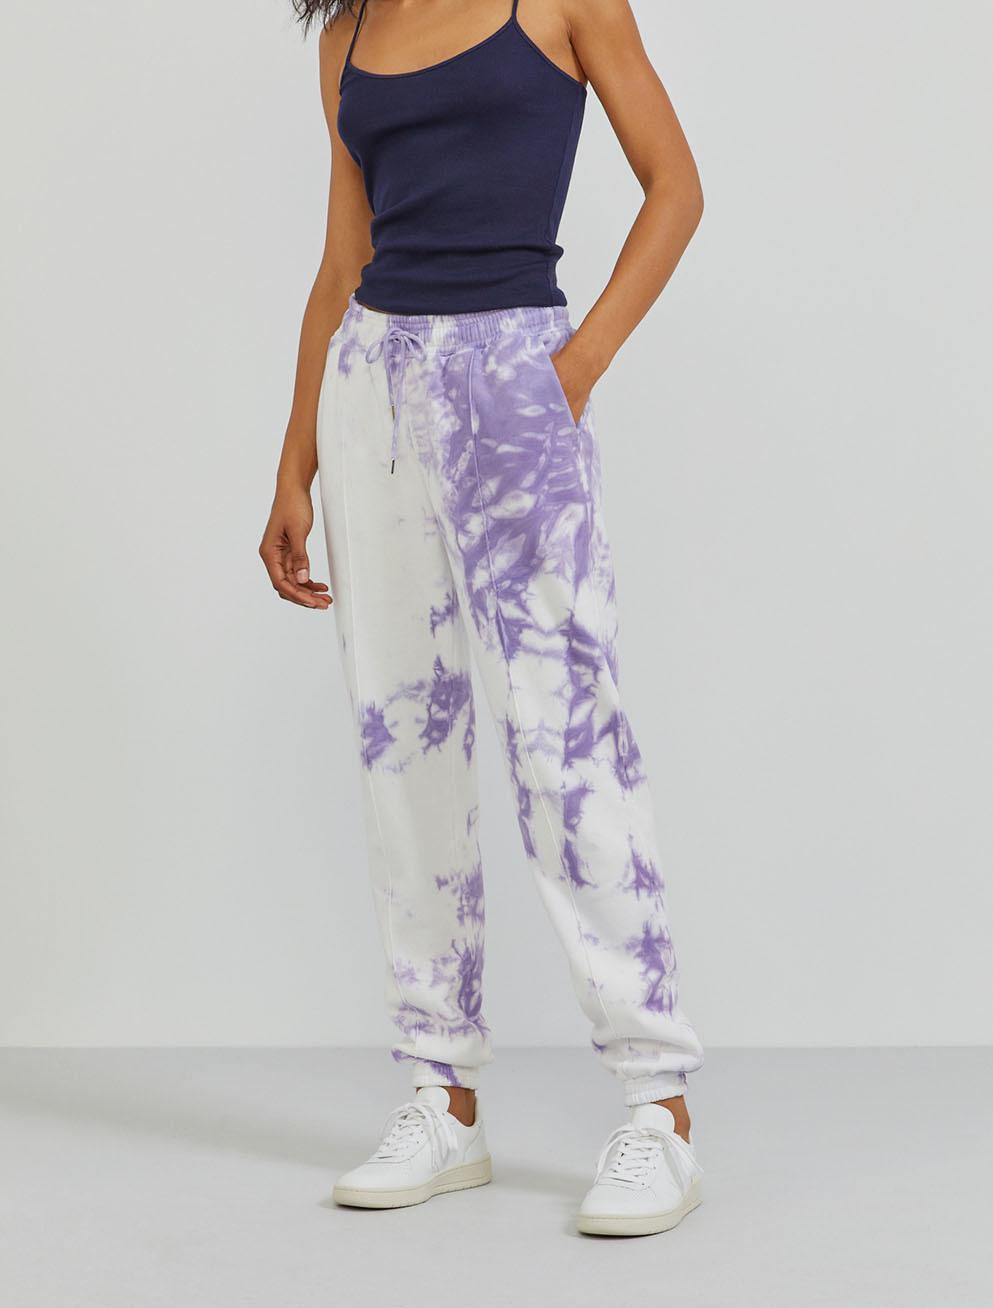 Organic cotton boy-fit sweatpants with tie-dye